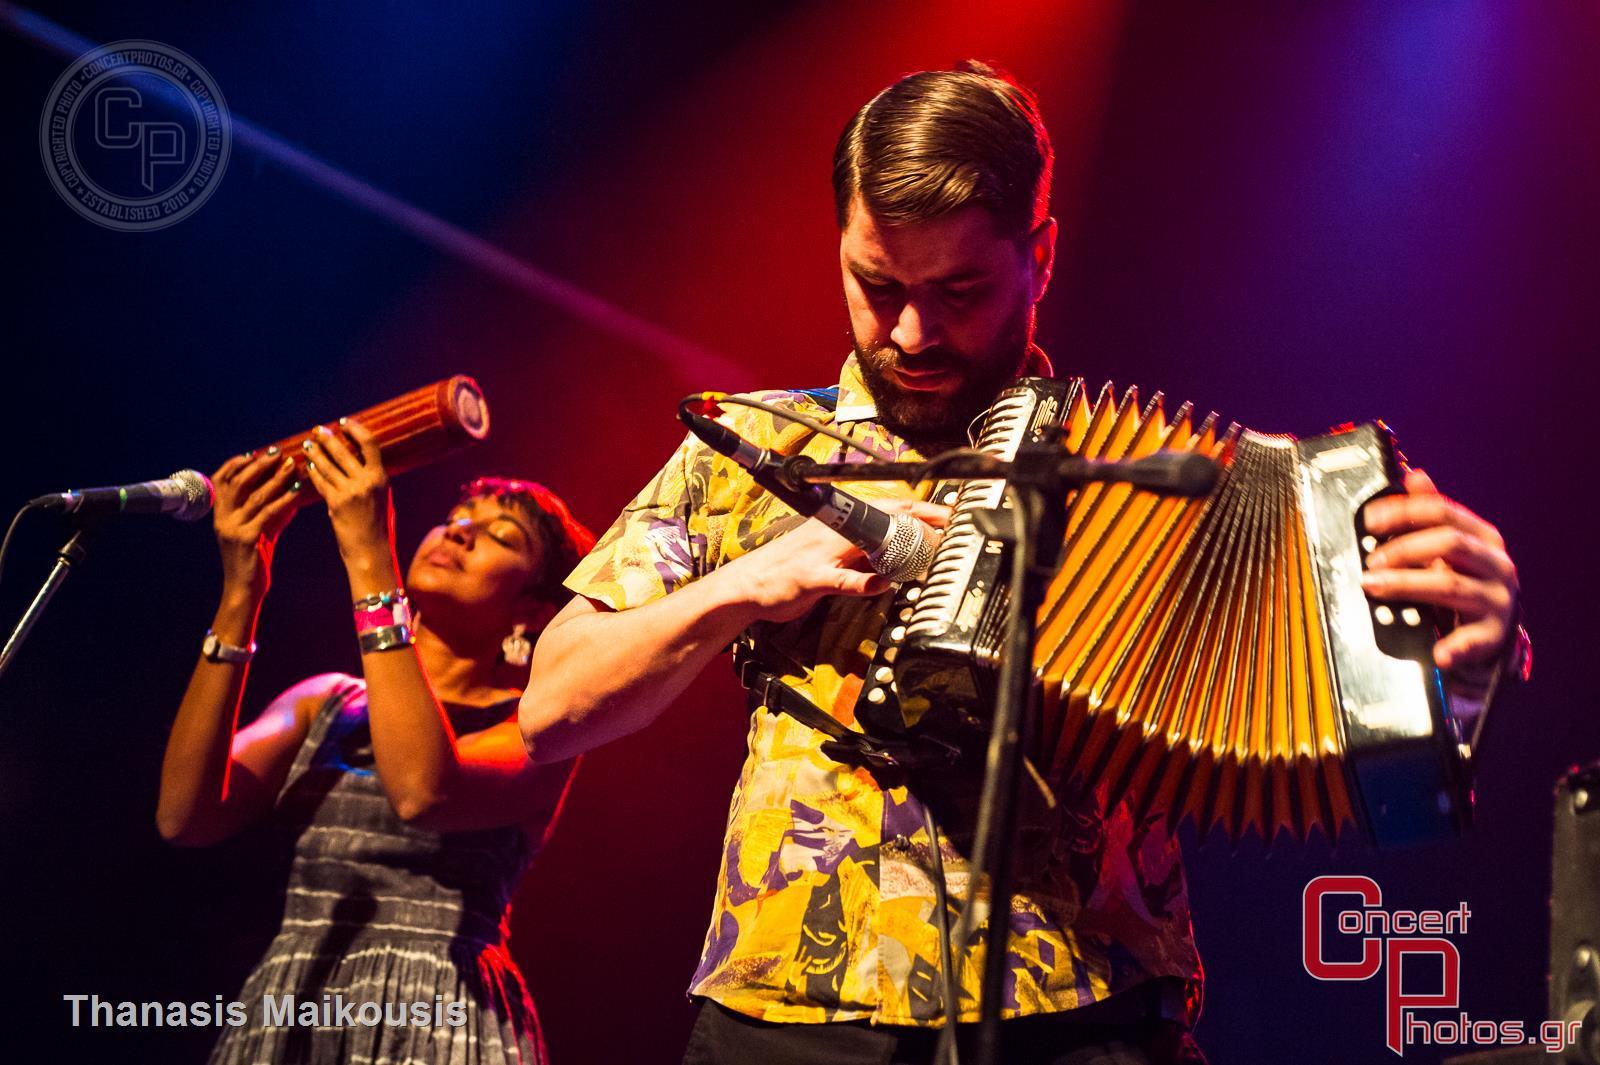 Quantic & Kill Emil -Quantic Kill Emil Gagarin photographer: Thanasis Maikousis - ConcertPhotos - 20141023_2302_25